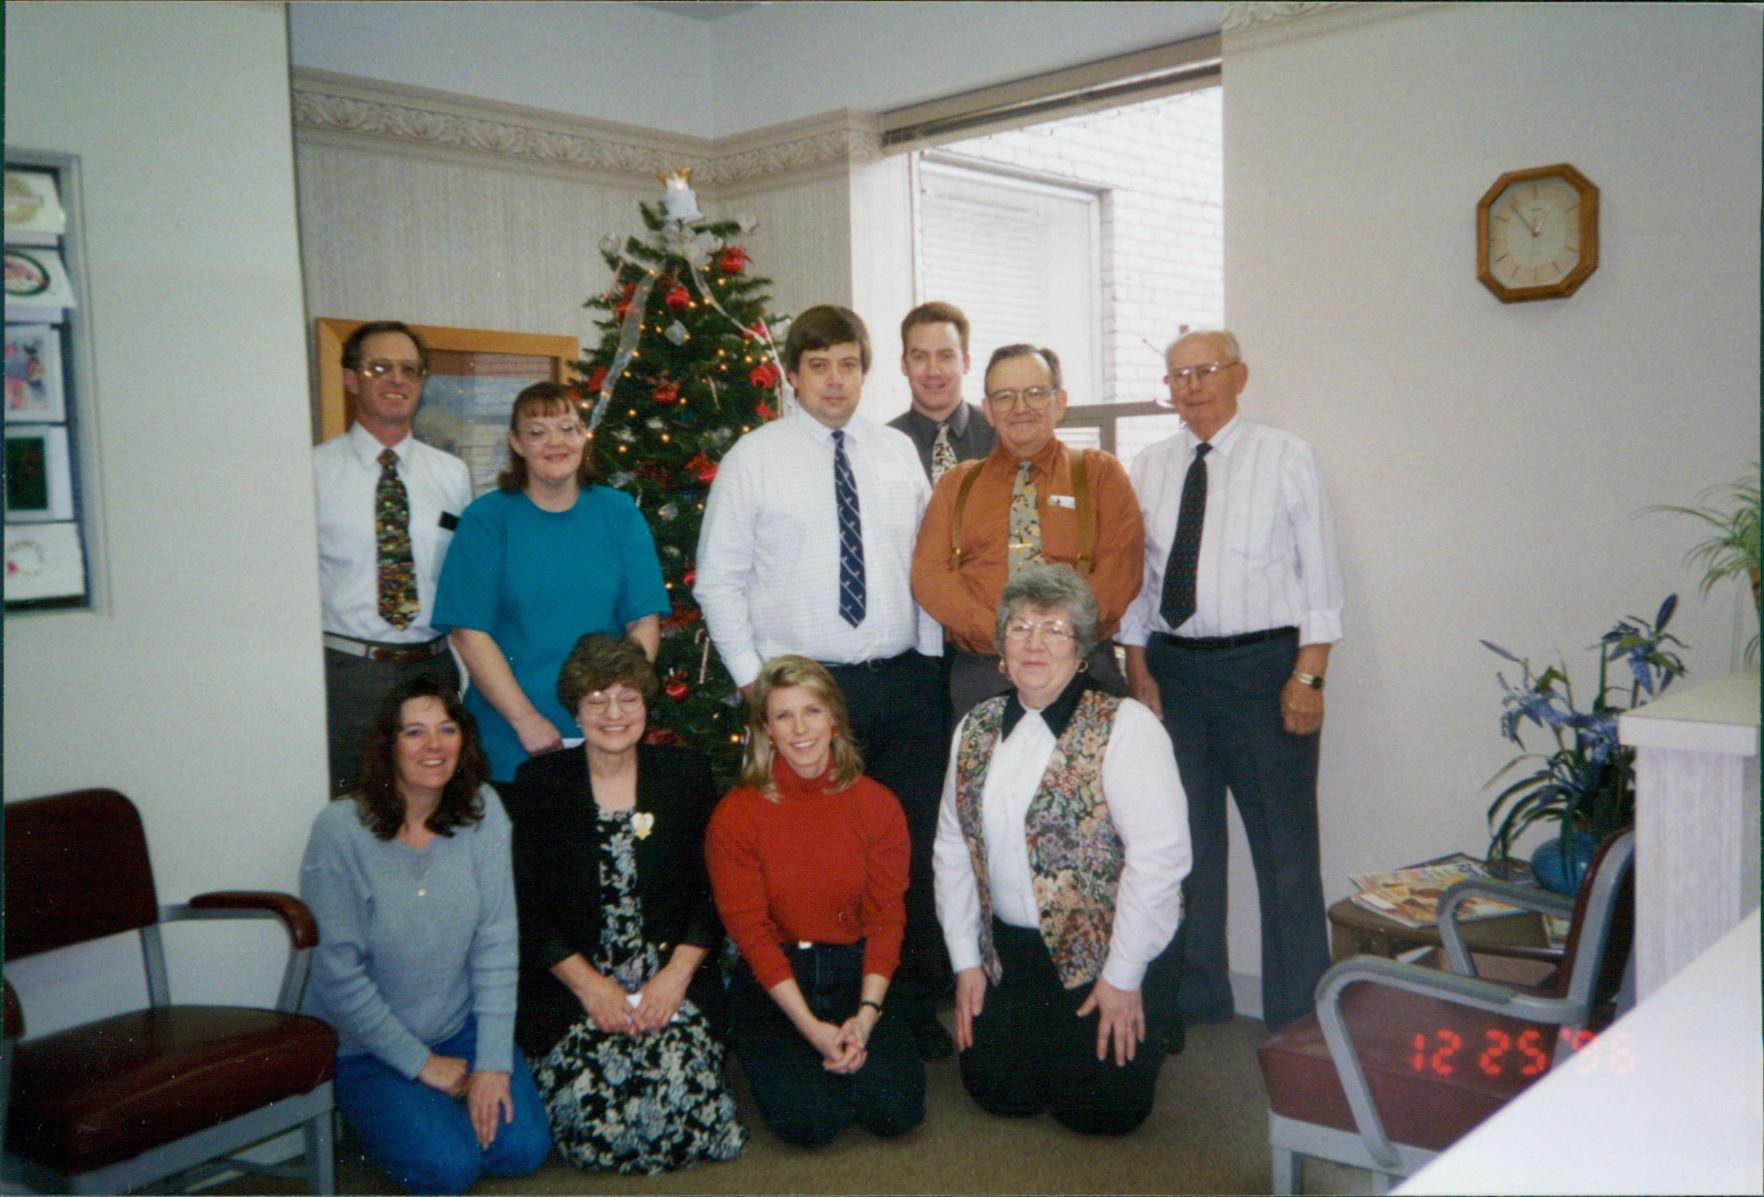 Lewis, Brenda Swart, Moeller, Dan McDonald, Snyder, Eveson, Pam Profily, Judy Clemens, Amber Yates & Betty Turley - 1996 Christmas